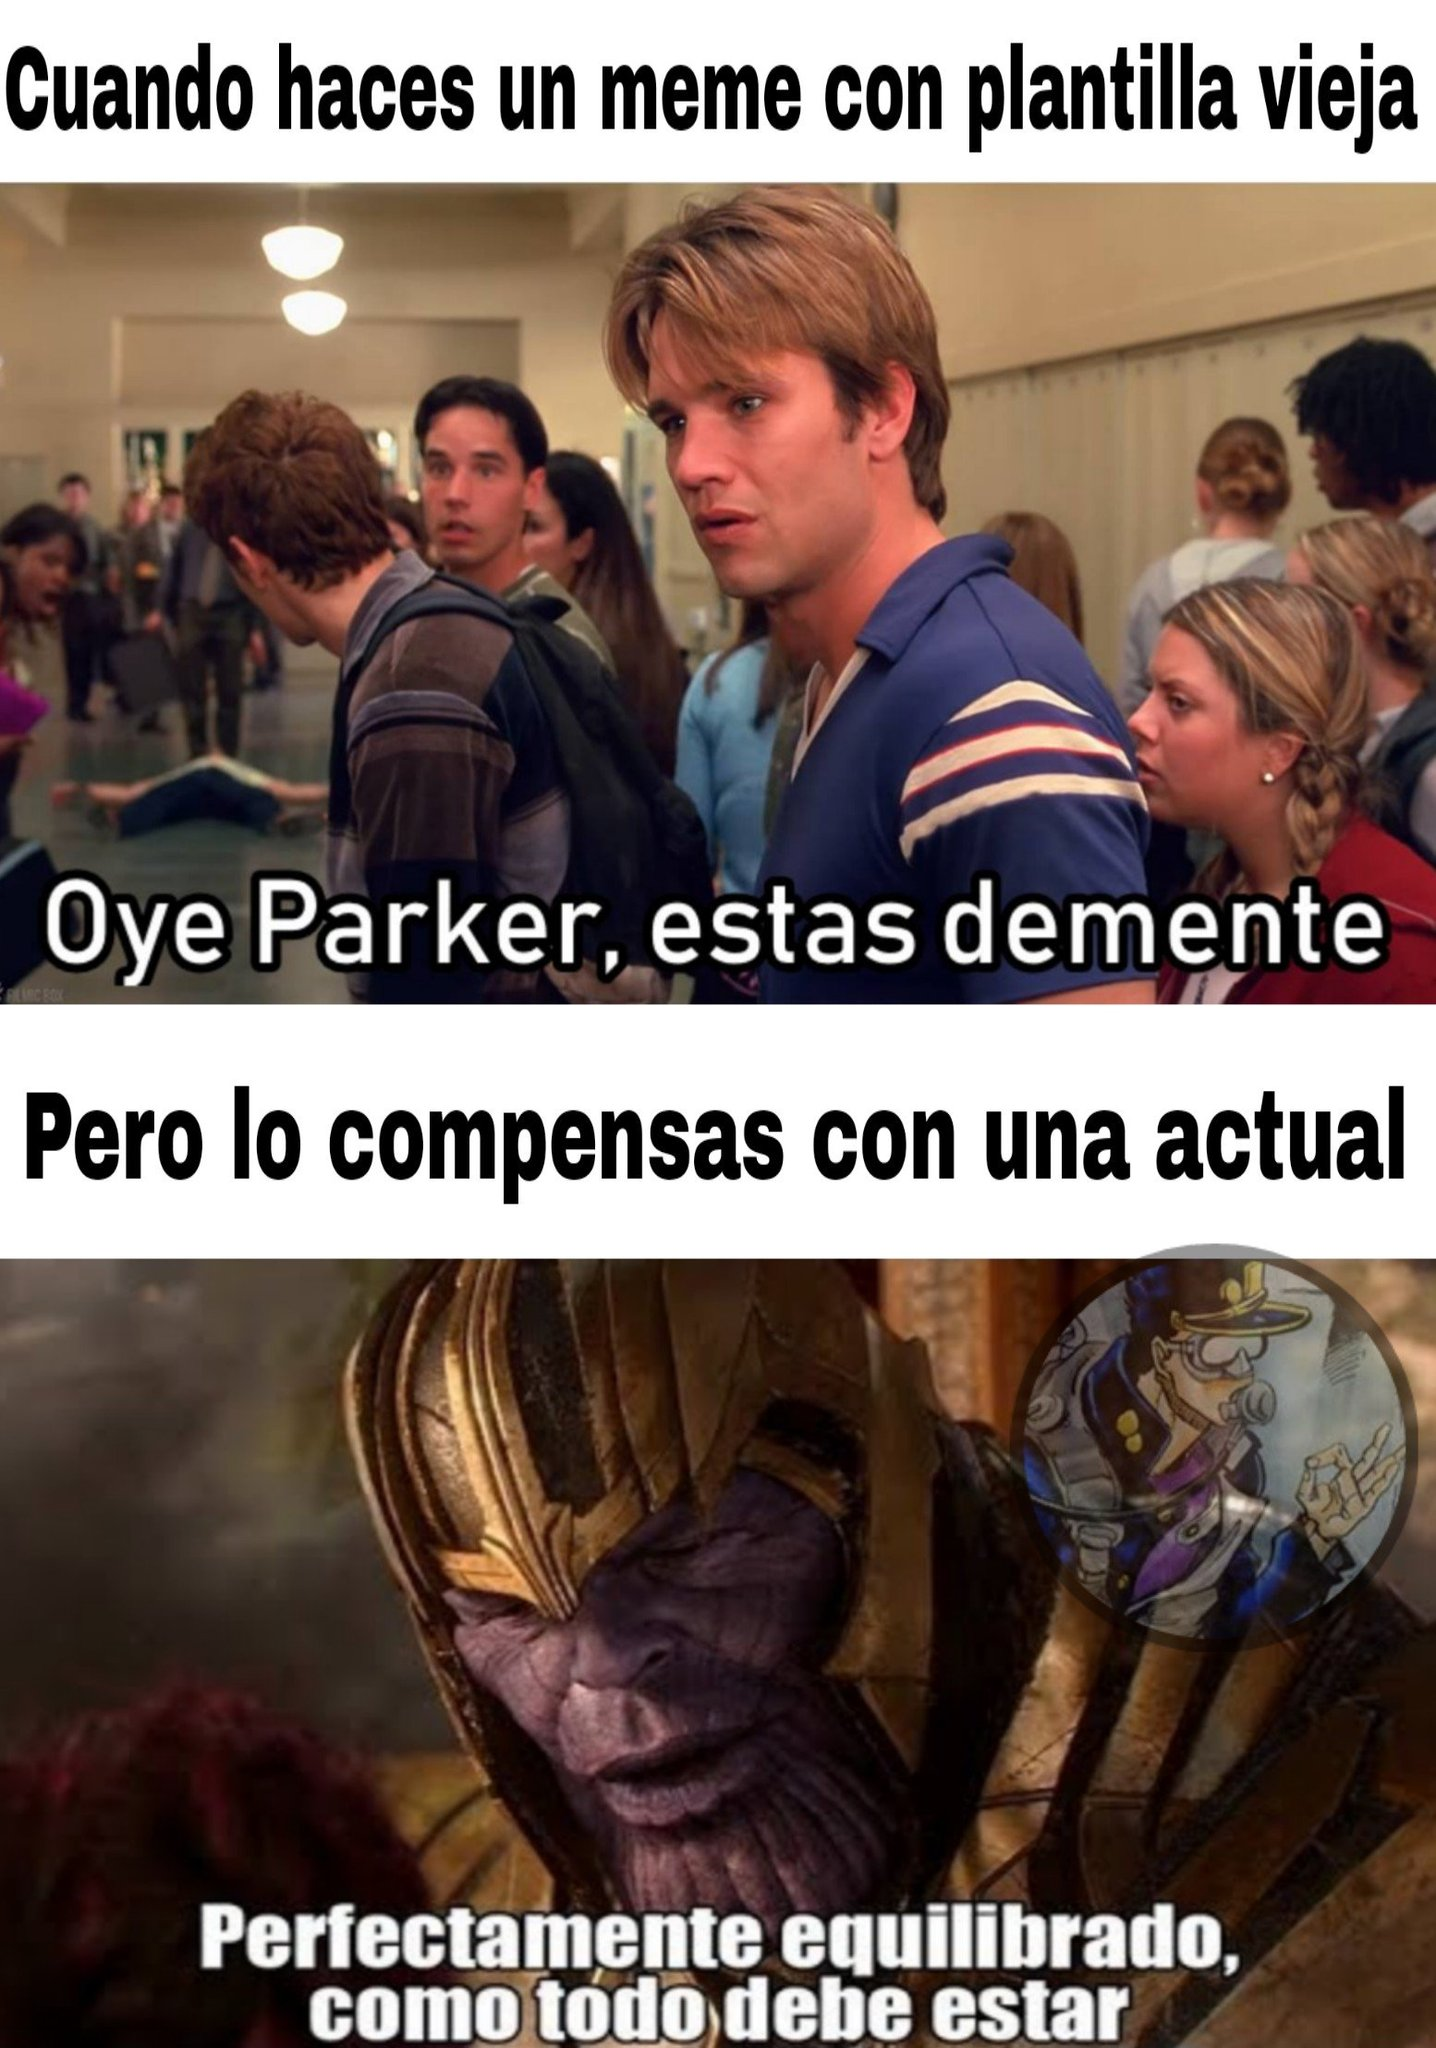 Meme original+Plantilla Vieja=Autor matate xfa